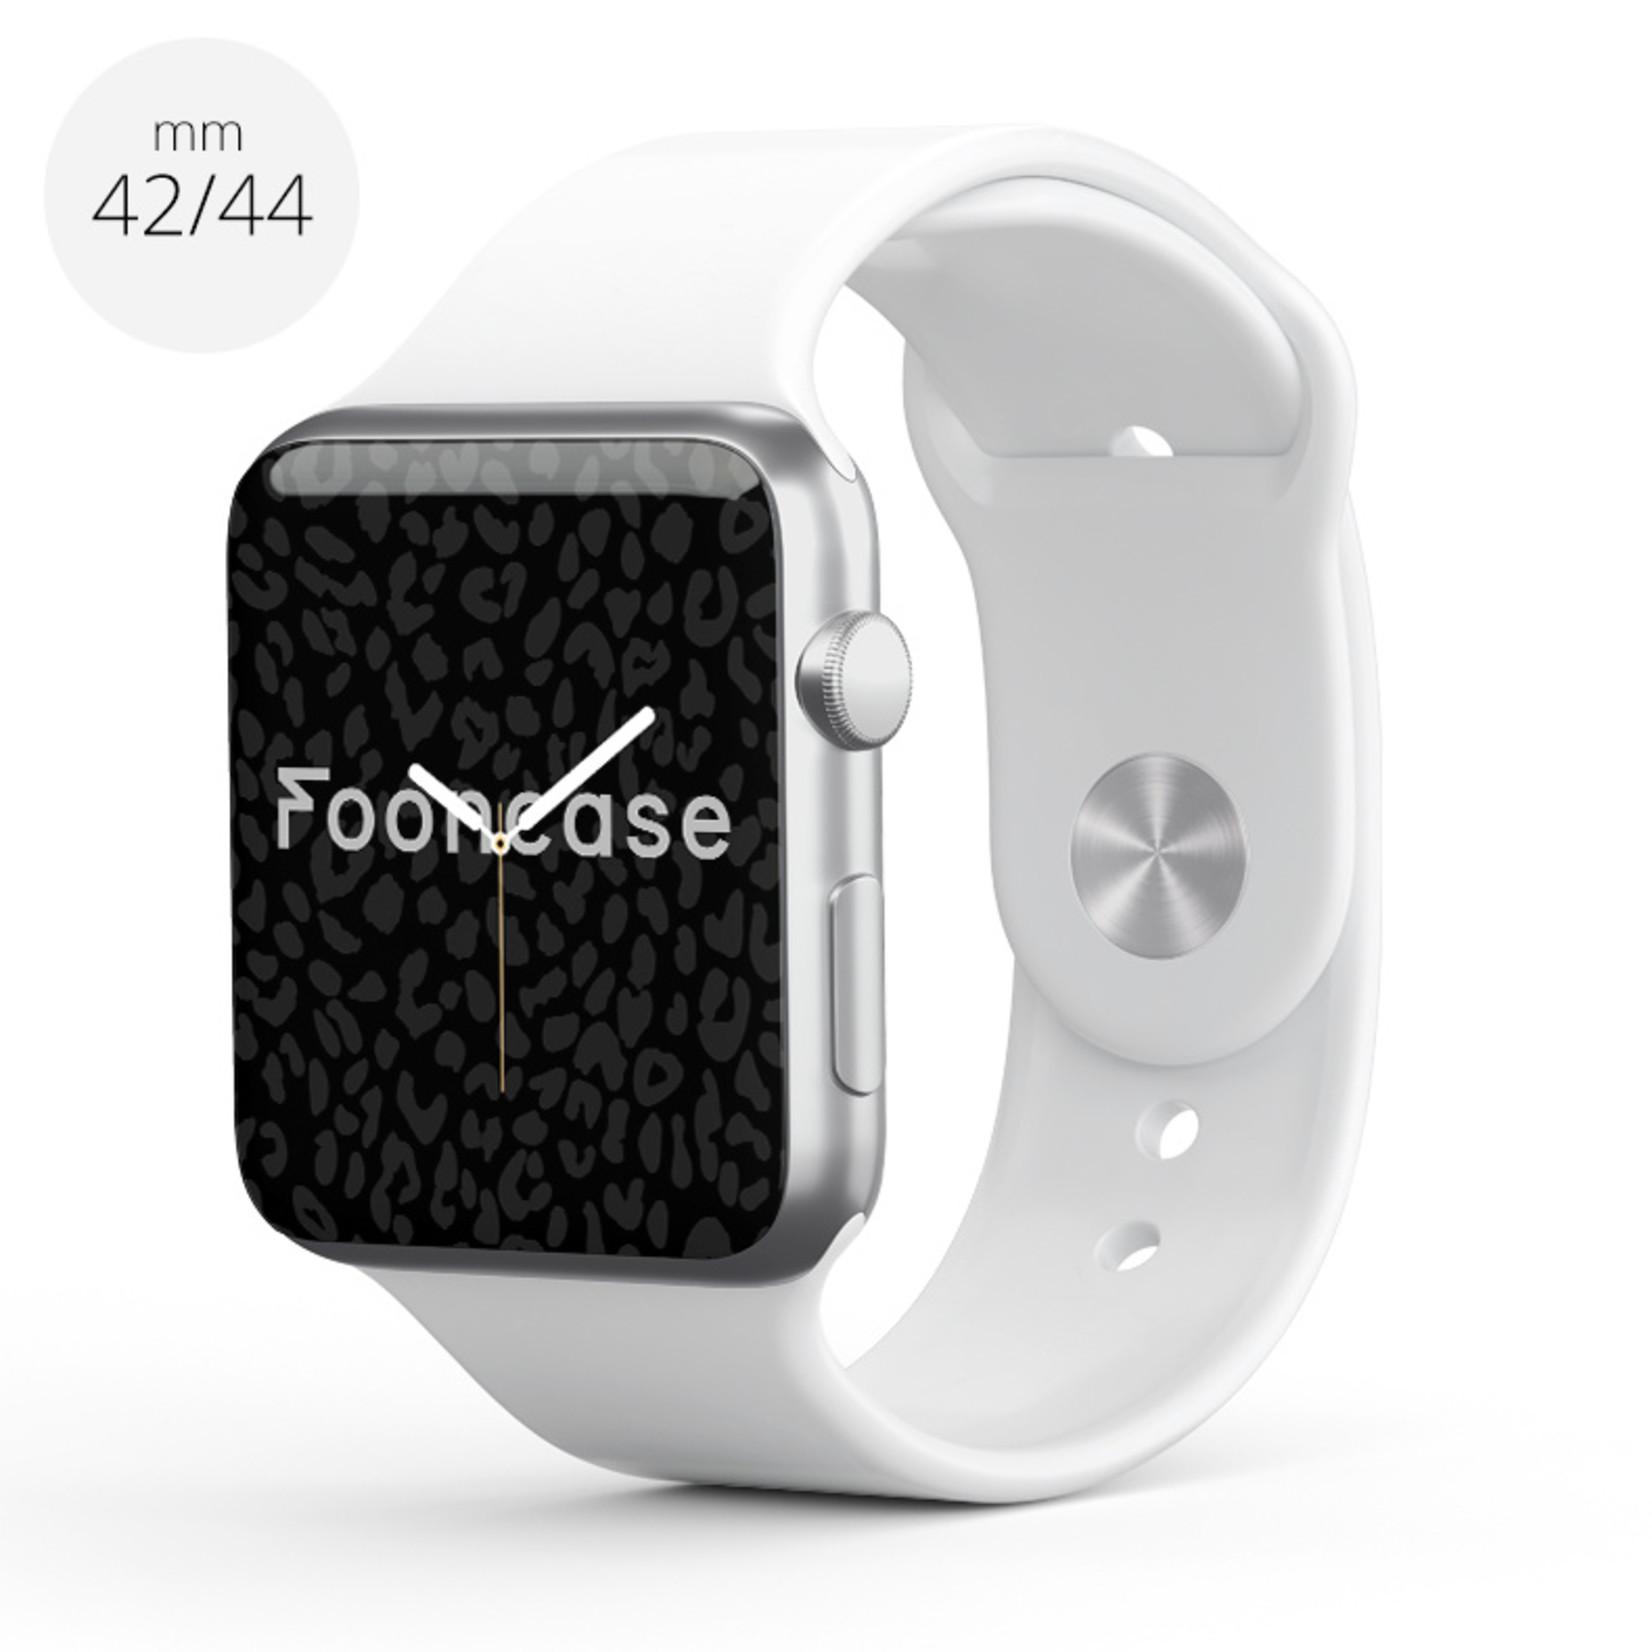 FOONCASE Apple Watch Series (1 t/m 6 / SE) - Weiß - 42/44mm